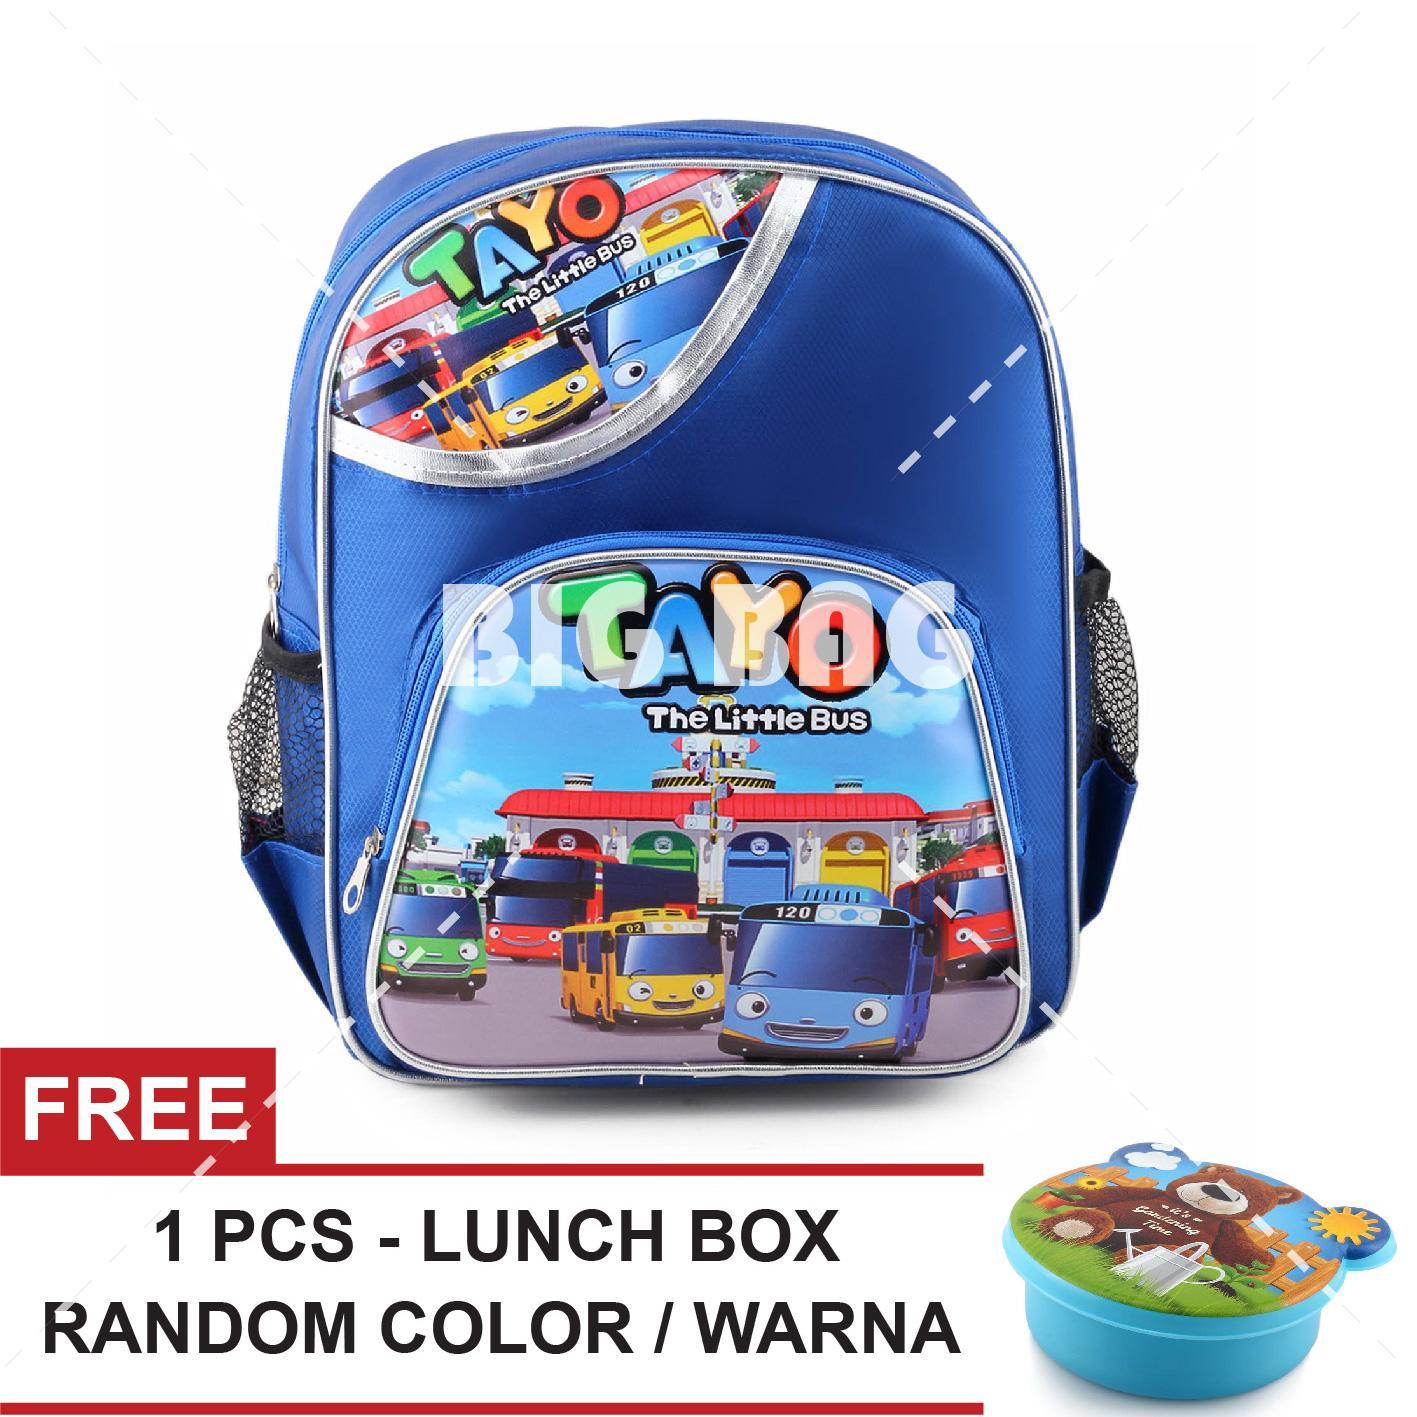 Tas Ransel Anak - Tayo The Little Bus - Ready For The Race - School Bag Tas Sekolah Anak + FREE Lunchbox Random Color / Model Tas Anak Tas Sekolah Tas Anak Karakter